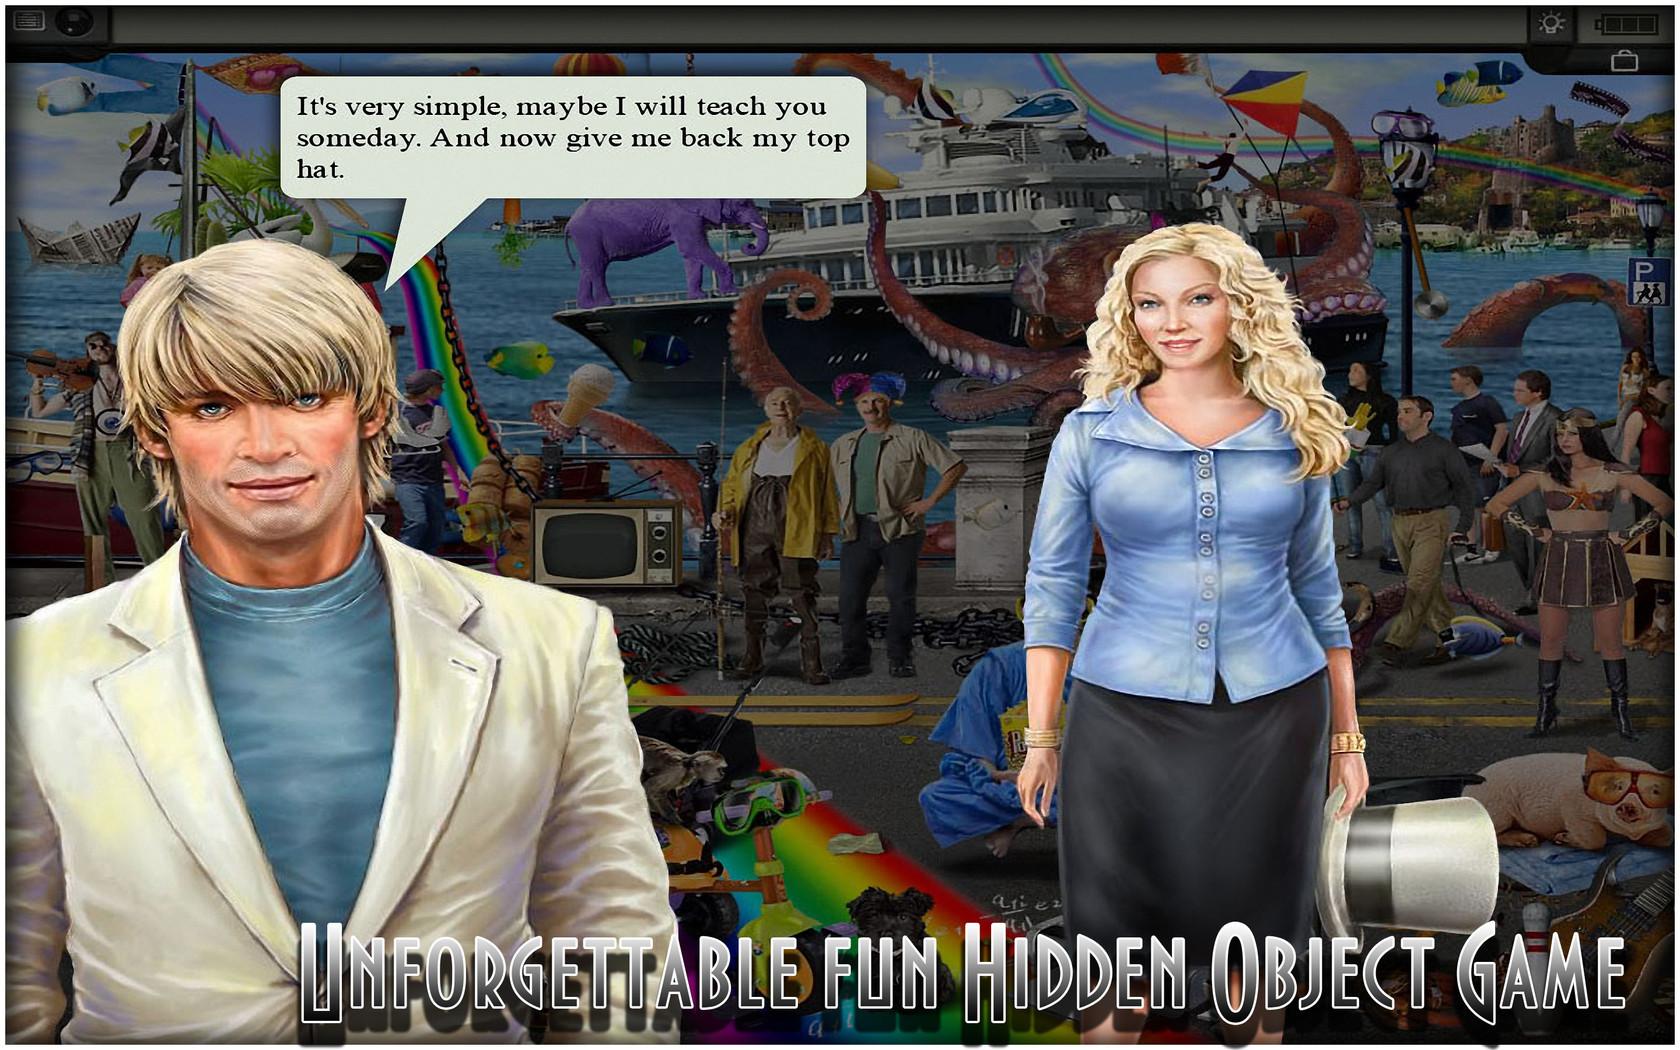 Hidden Object Bundle 5 In 1 Backgrounds, Compatible - PC, Mobile, Gadgets| 1680x1050 px